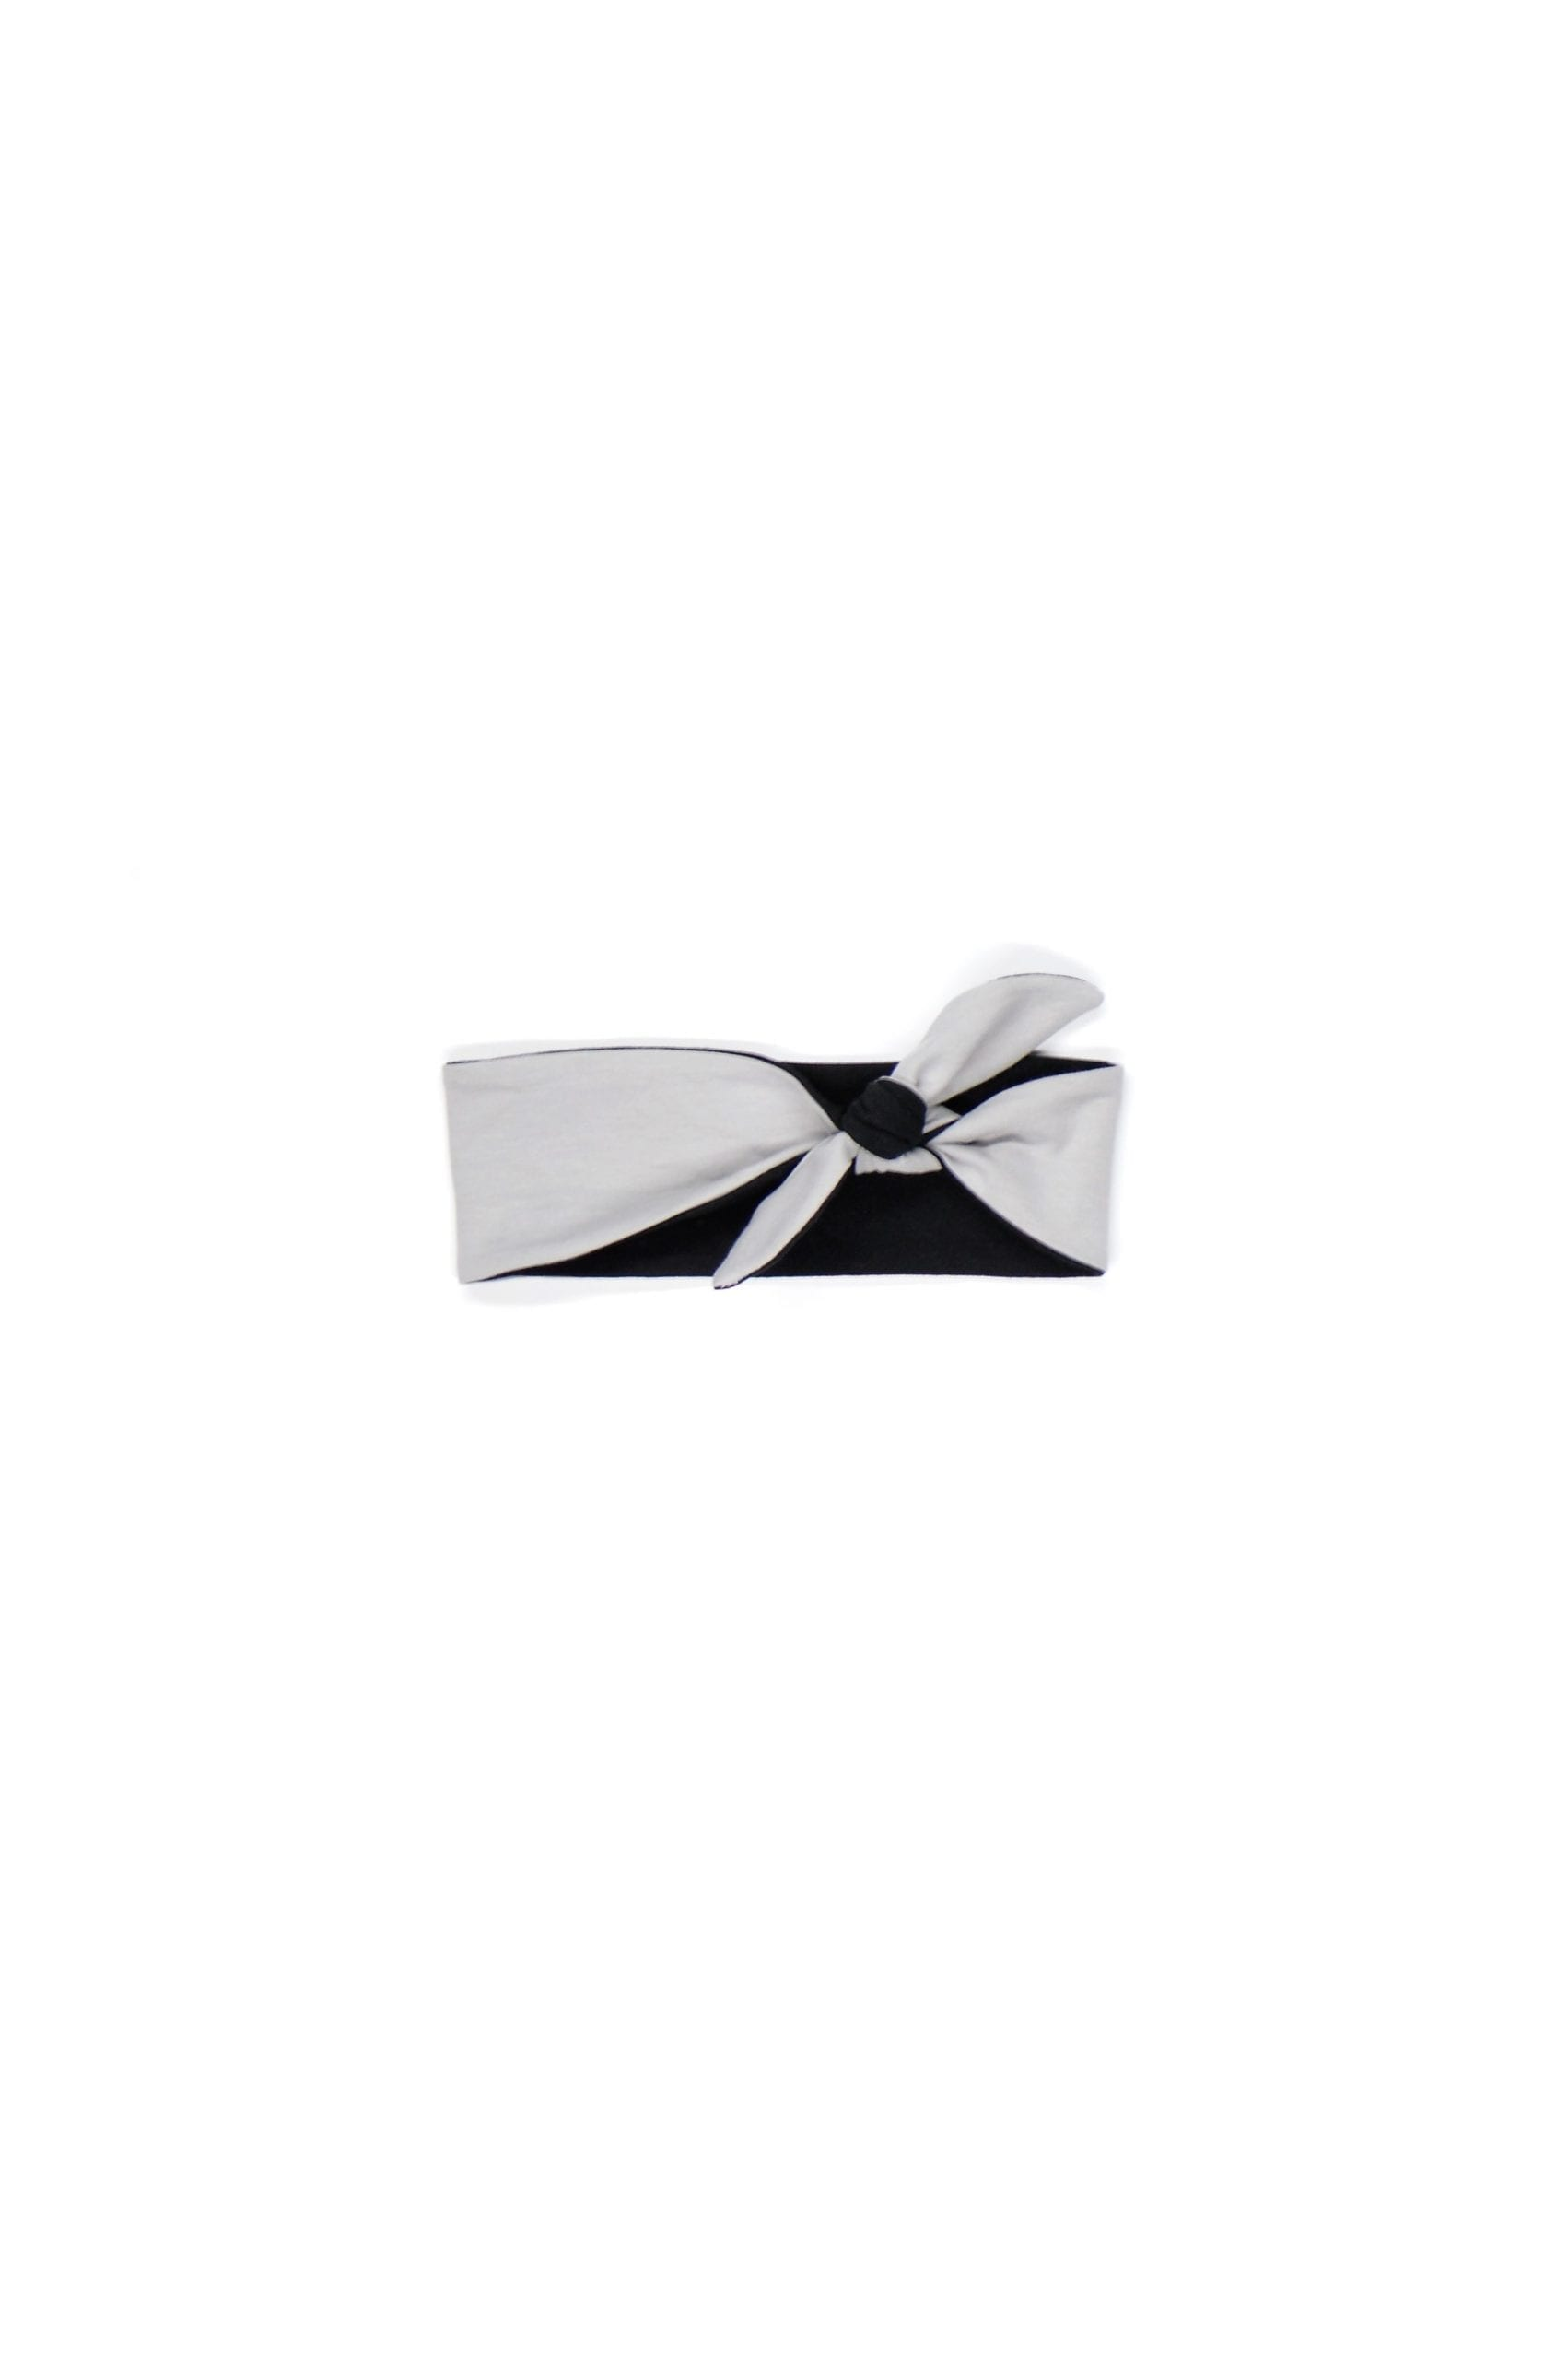 Black-grey knot headband for kid, toddler, baby, girl